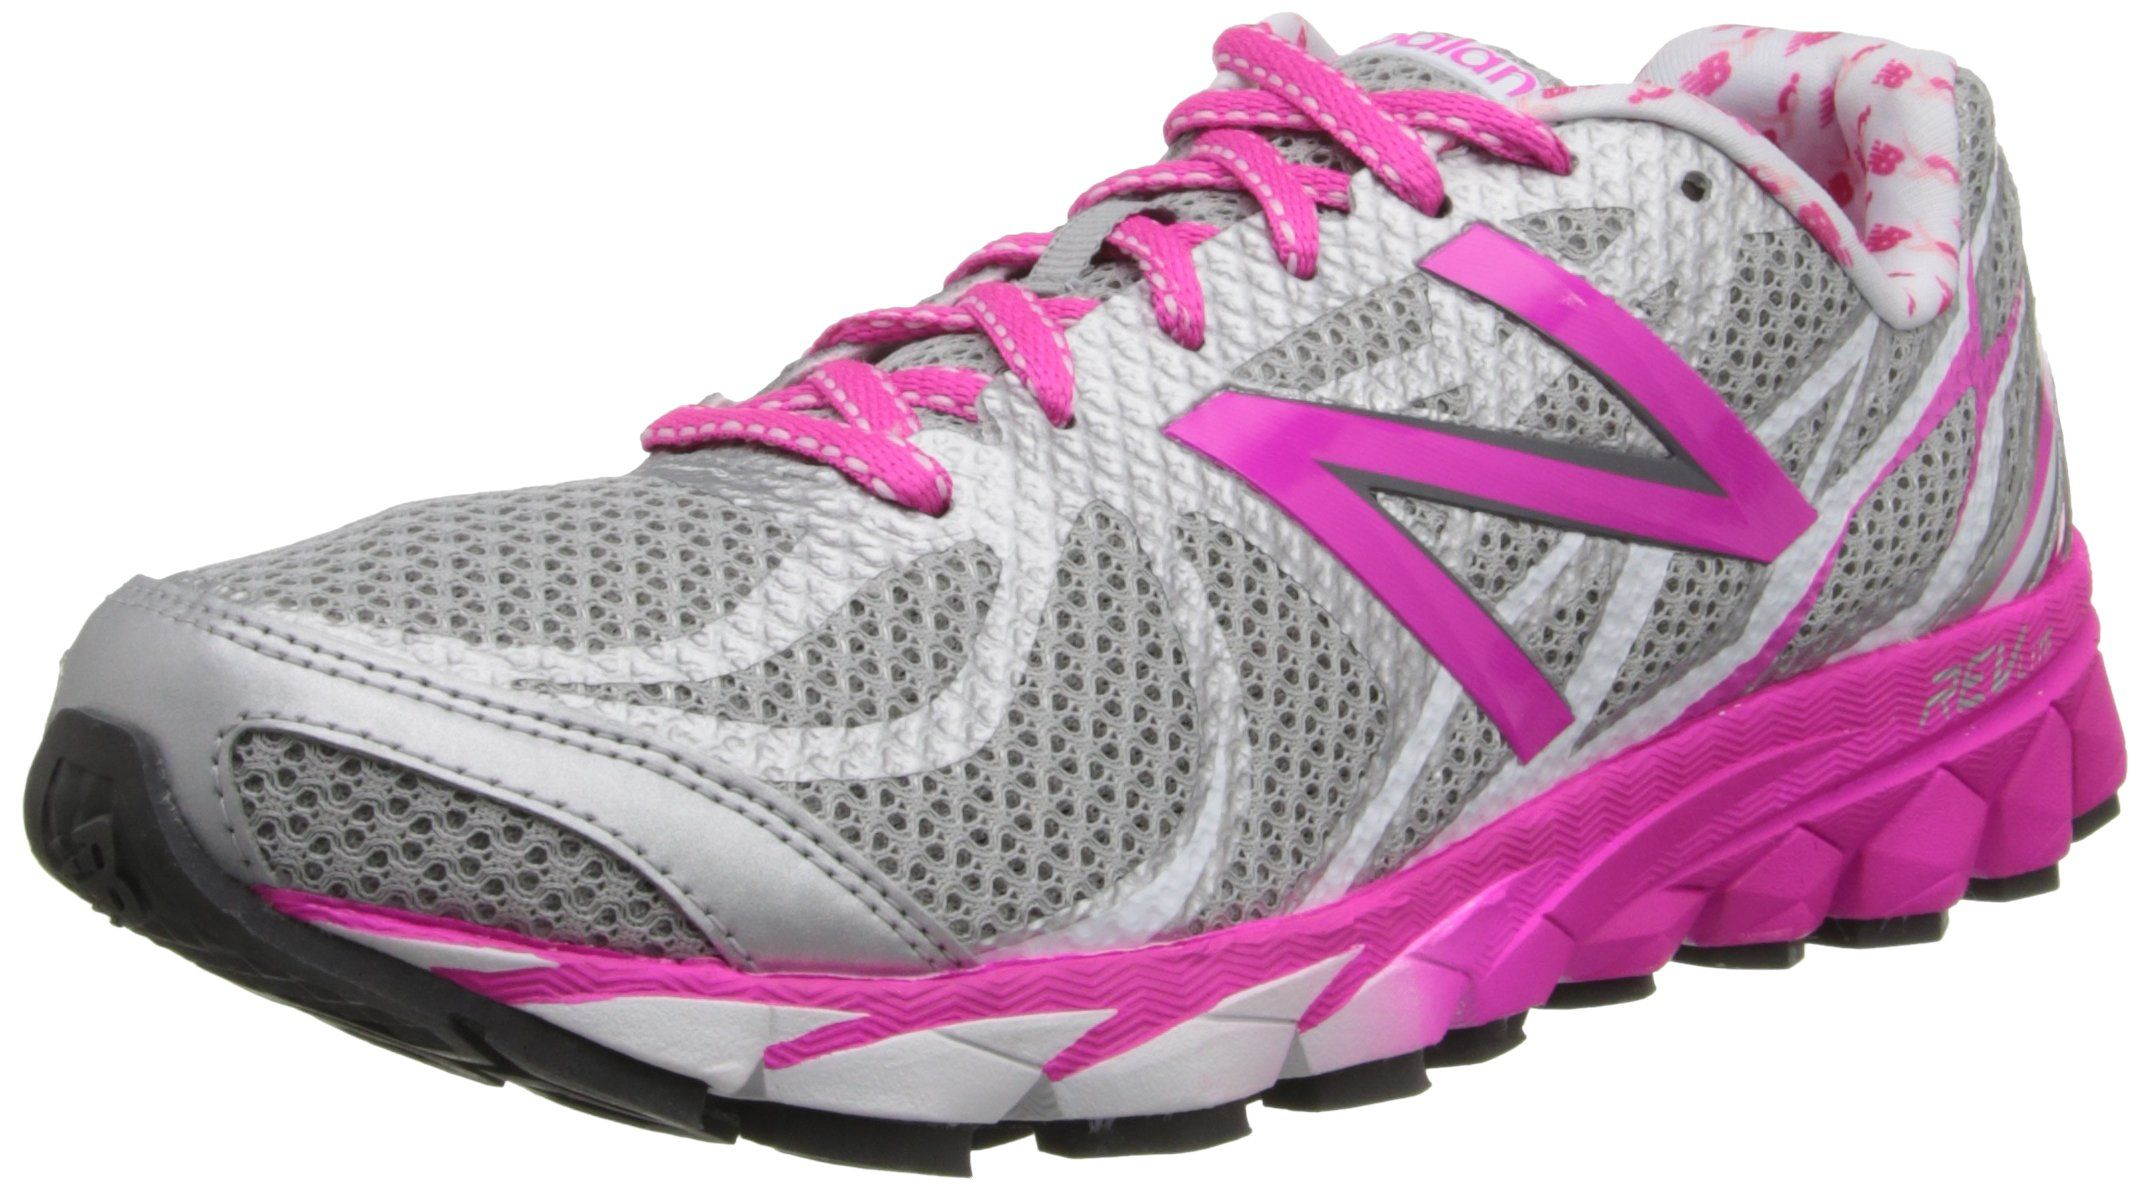 New balance women, Womens running shoes